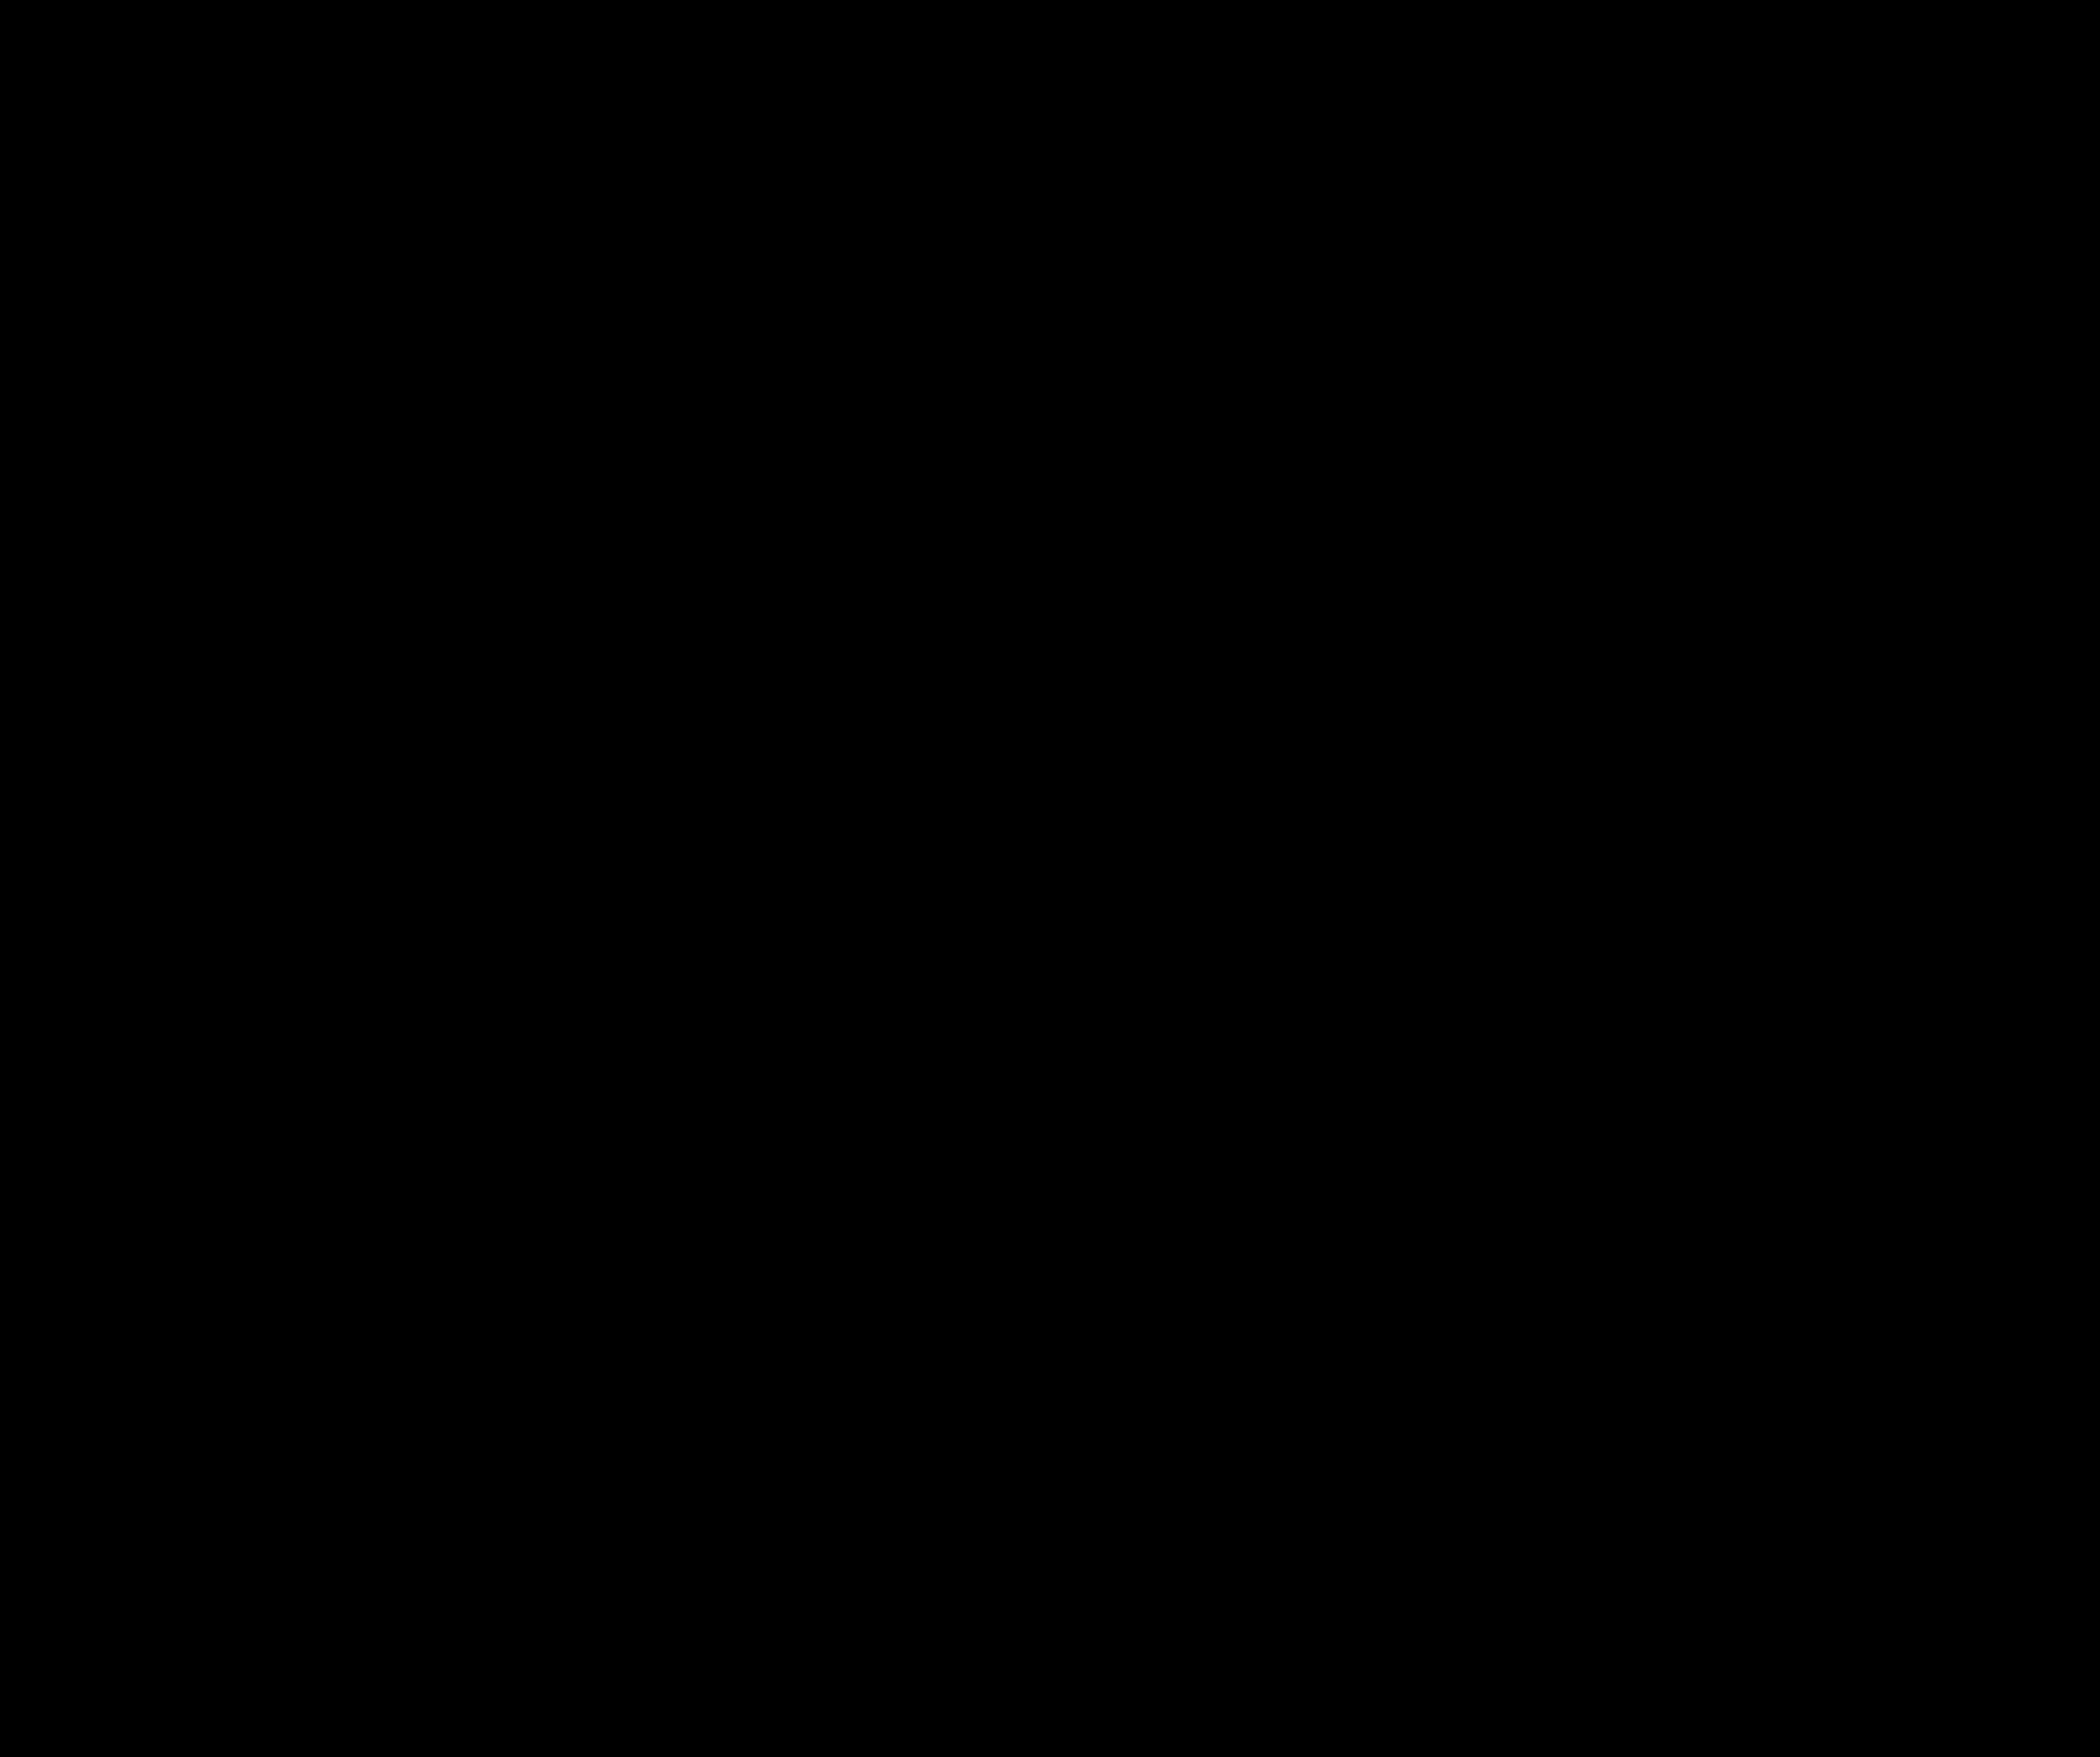 2400x2008 Clipart